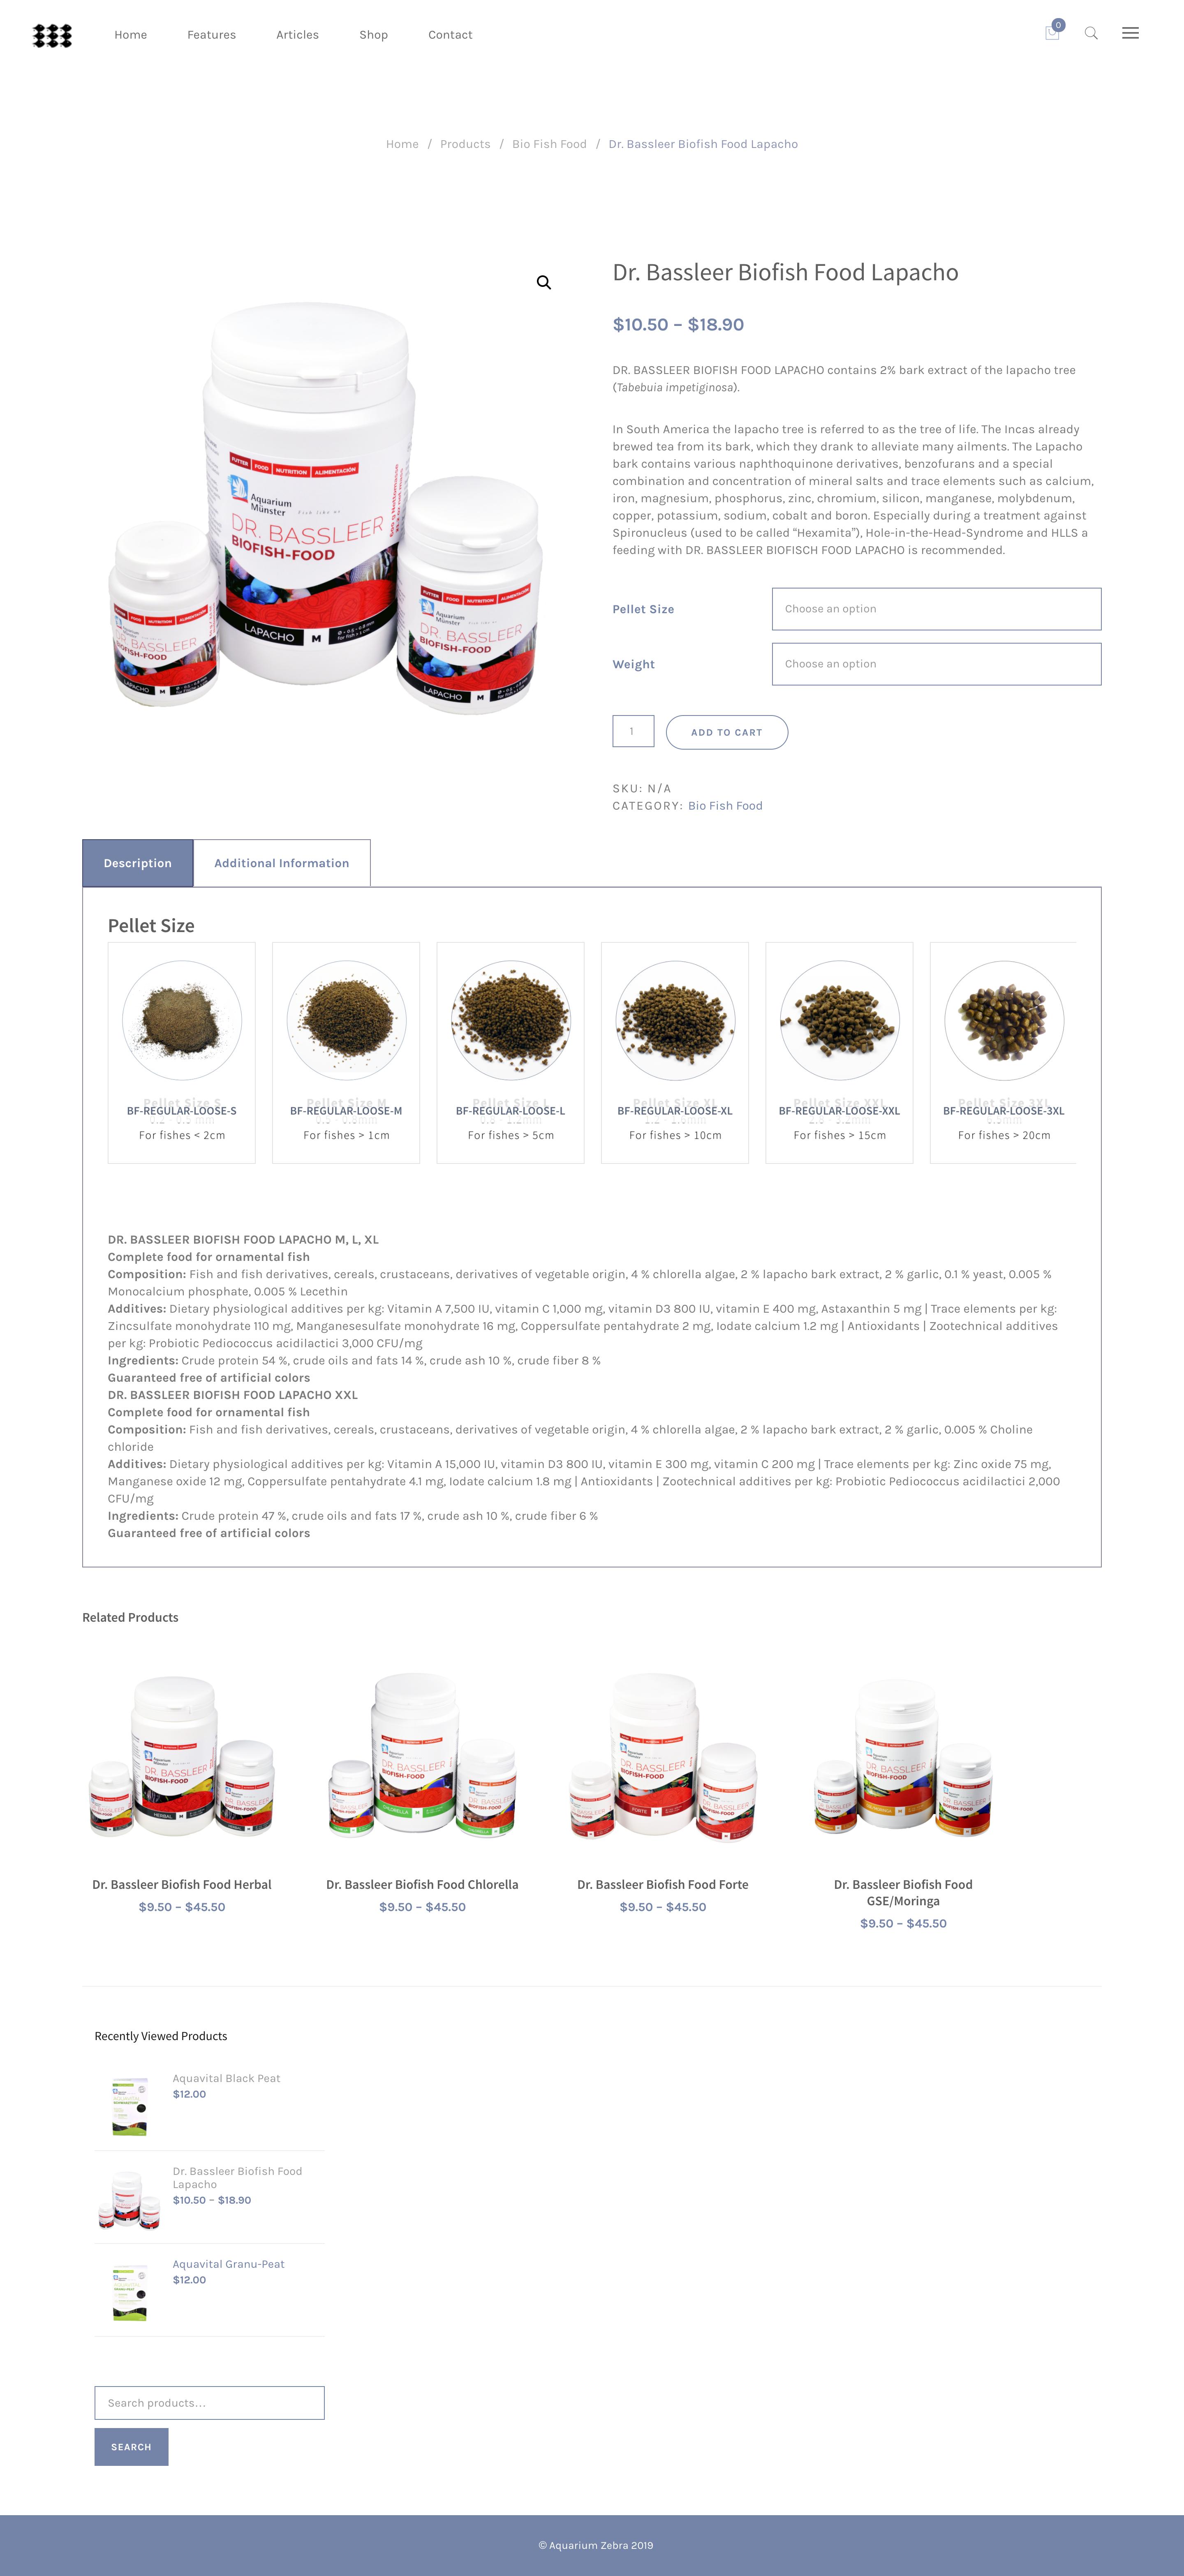 screencapture-aquariumzebra-sg-product-dr-bassleer-biofish-food-lapacho-2020-05-24-22_52_30